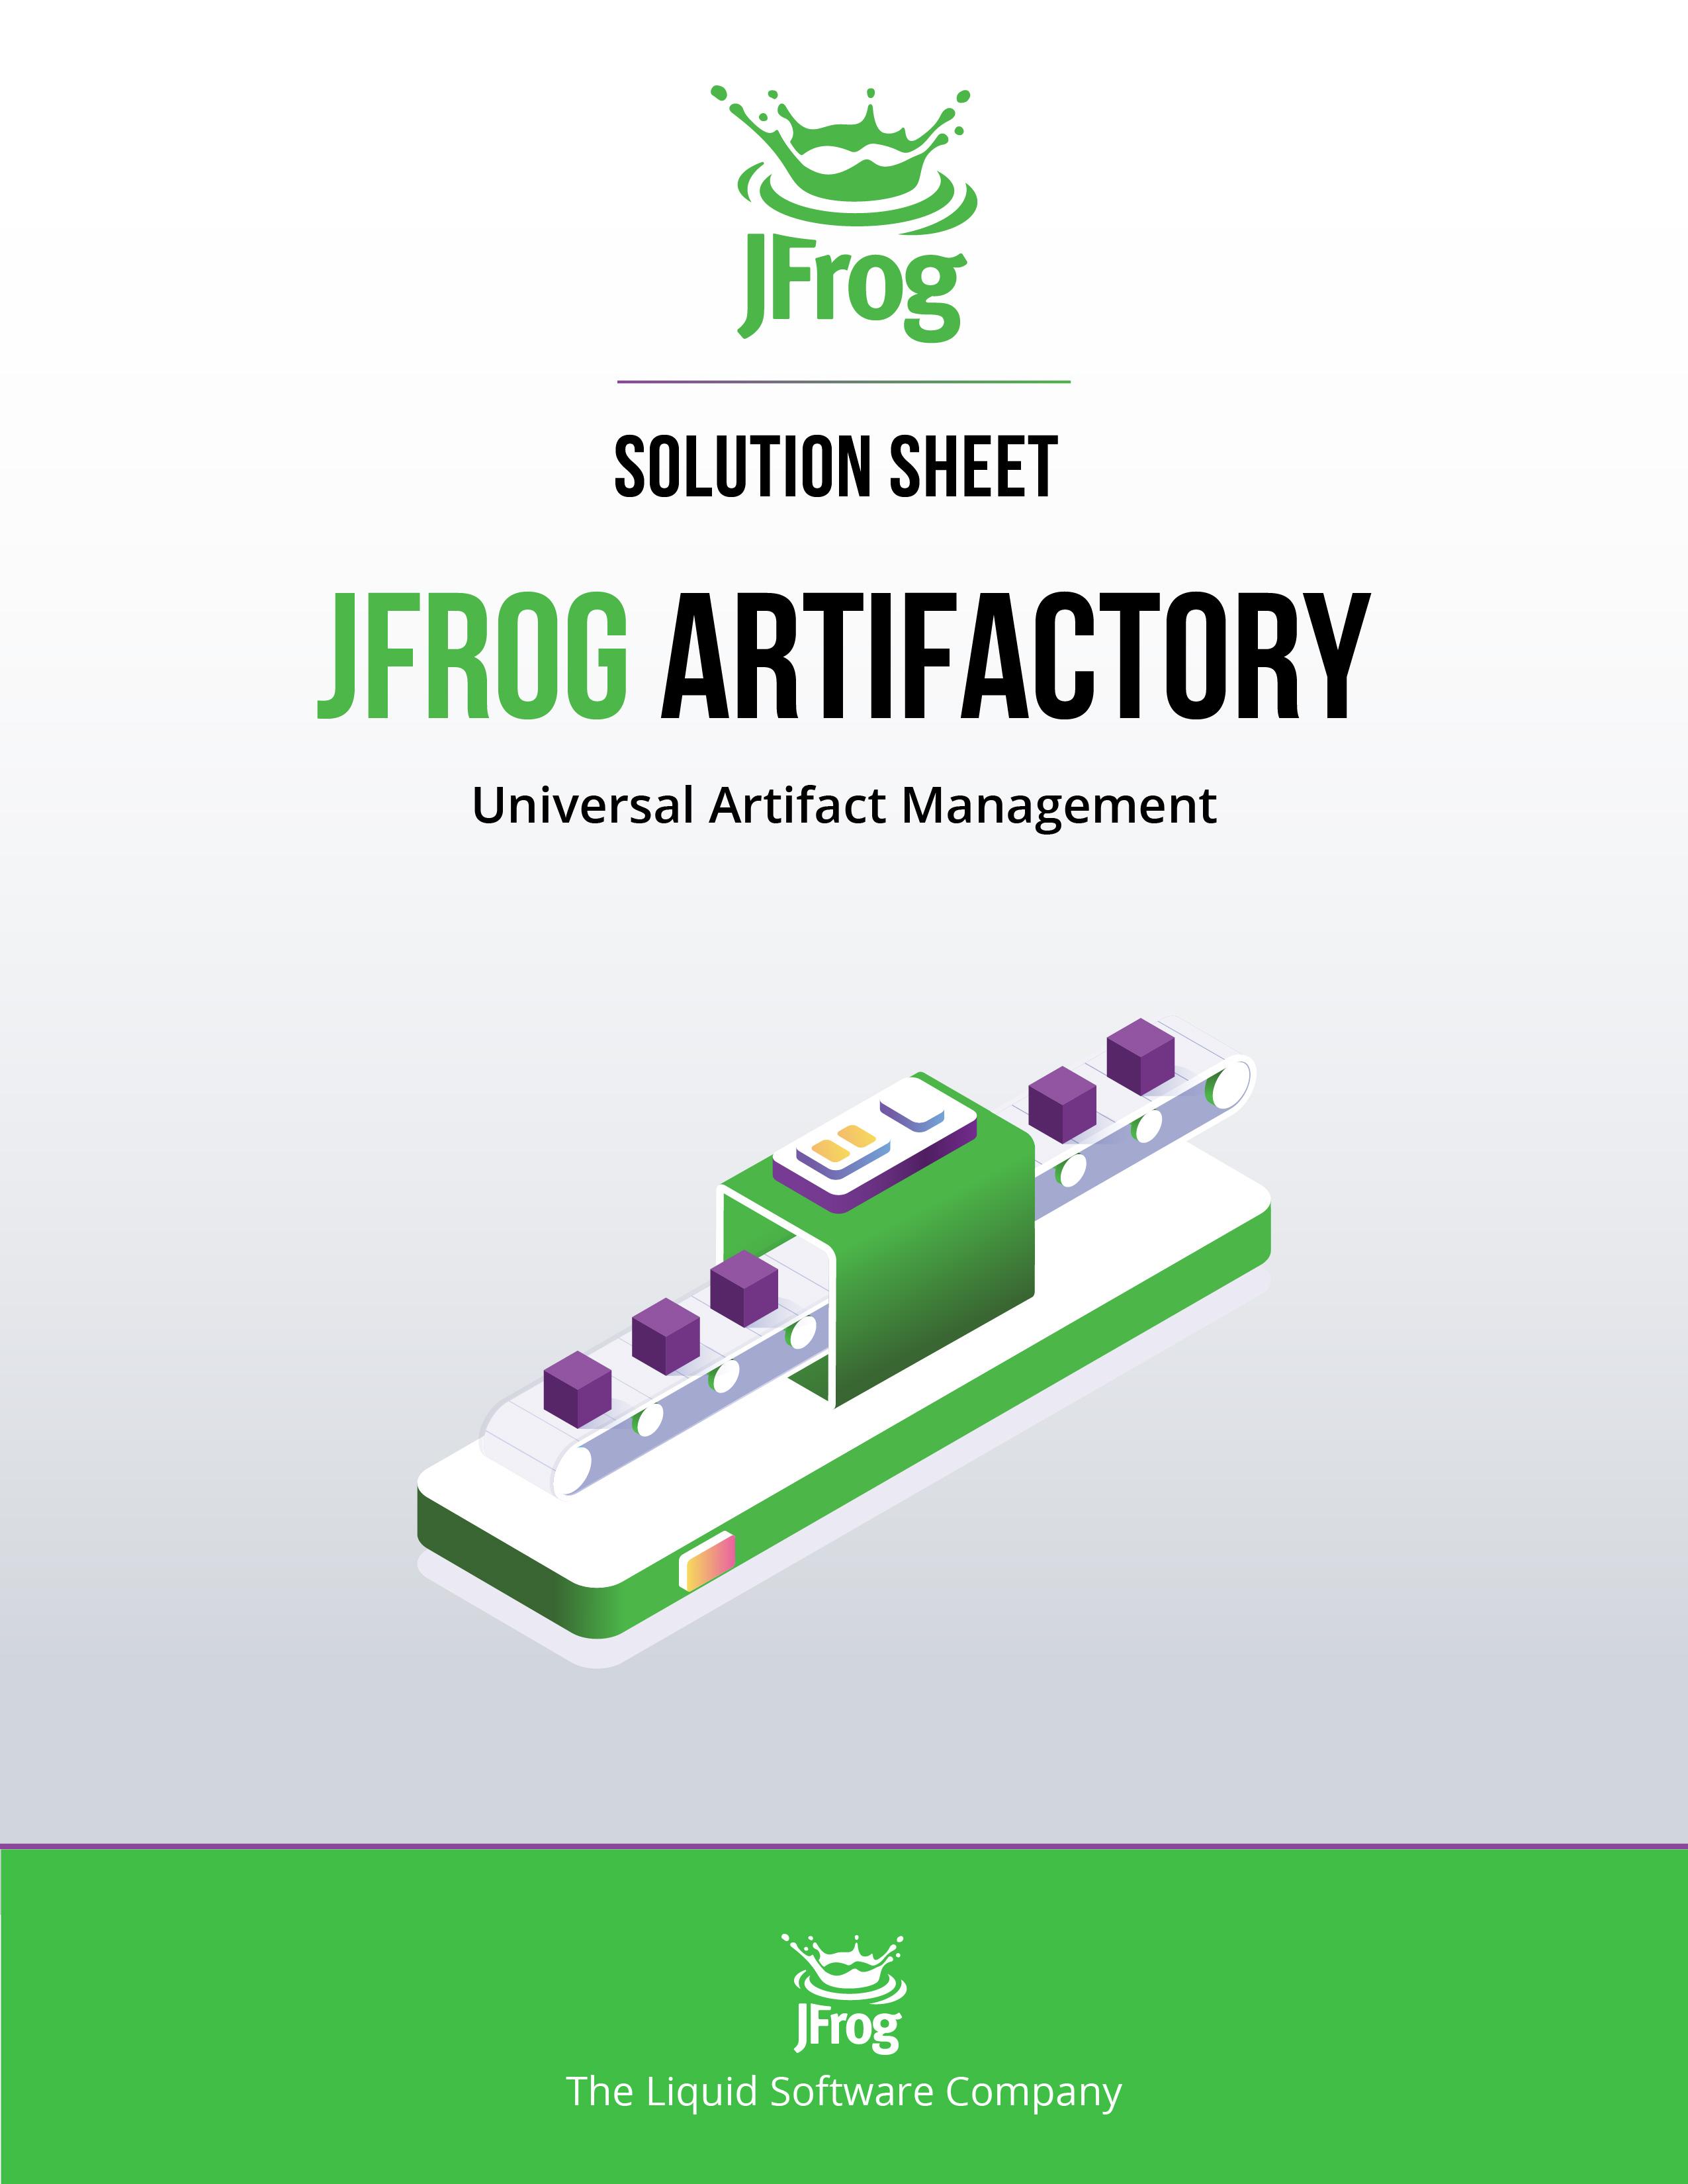 JFrog Artifactory Solution Sheet